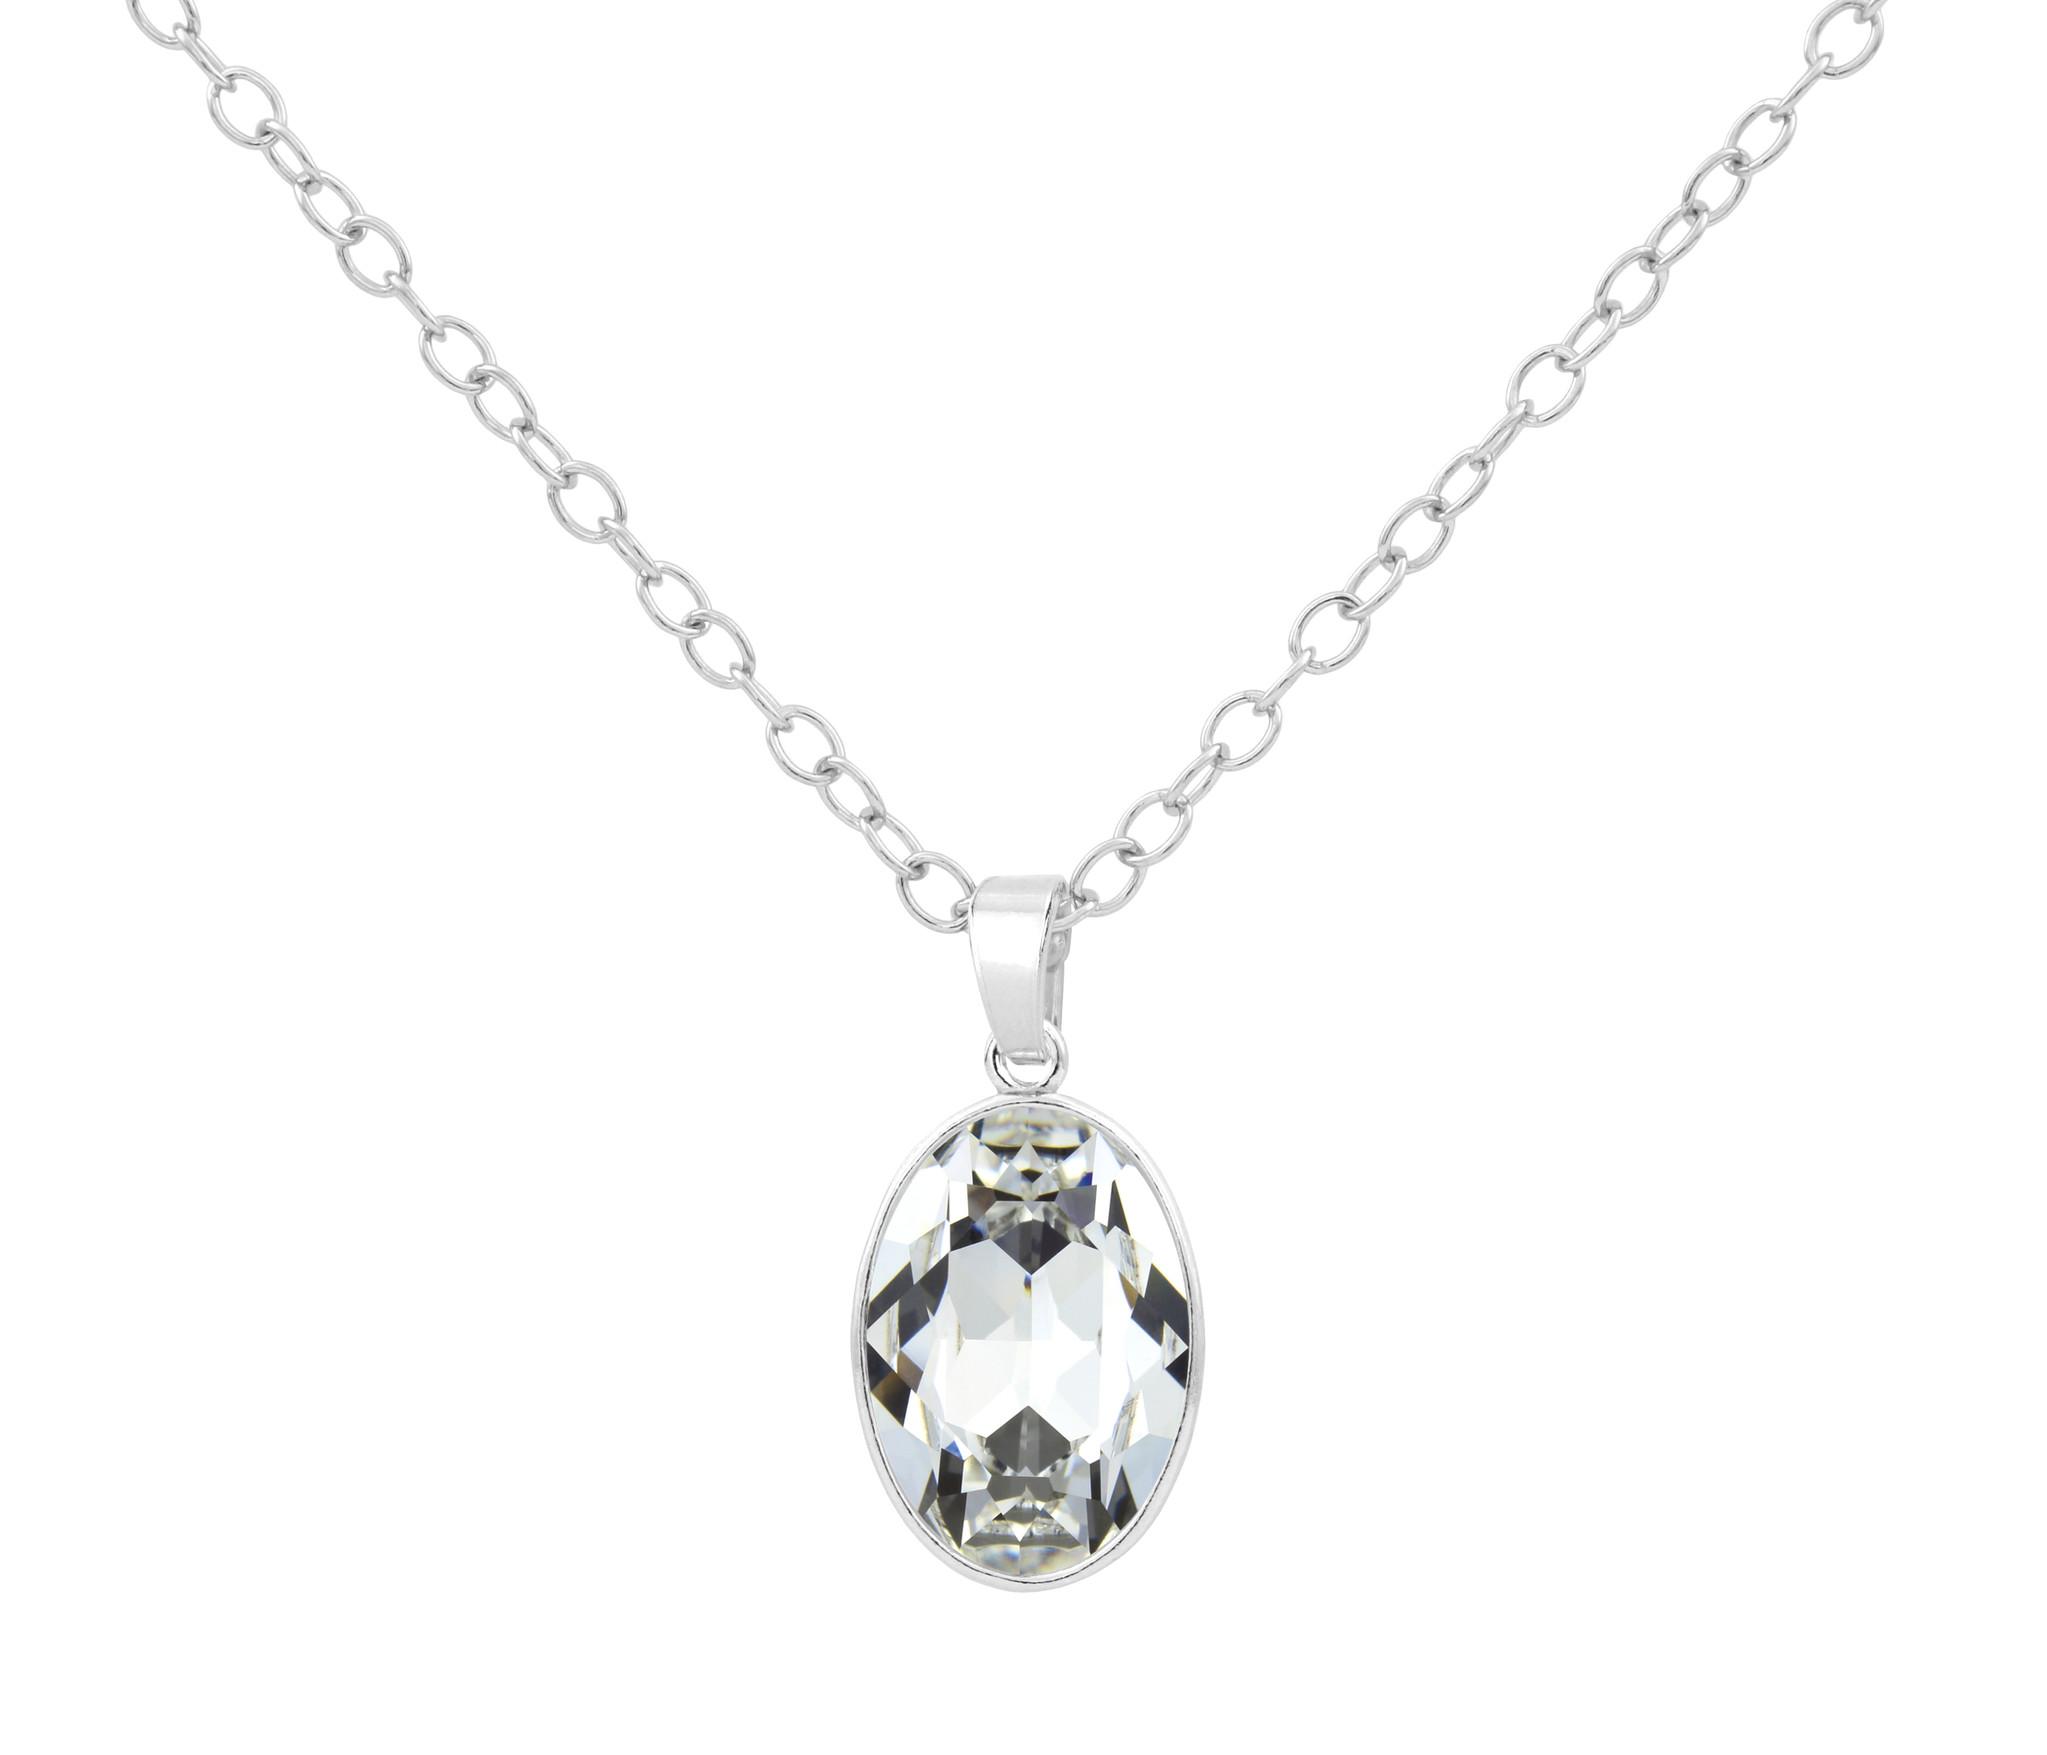 Necklace Swarovski crystal pendant sterling silver - ARLIZI 1688